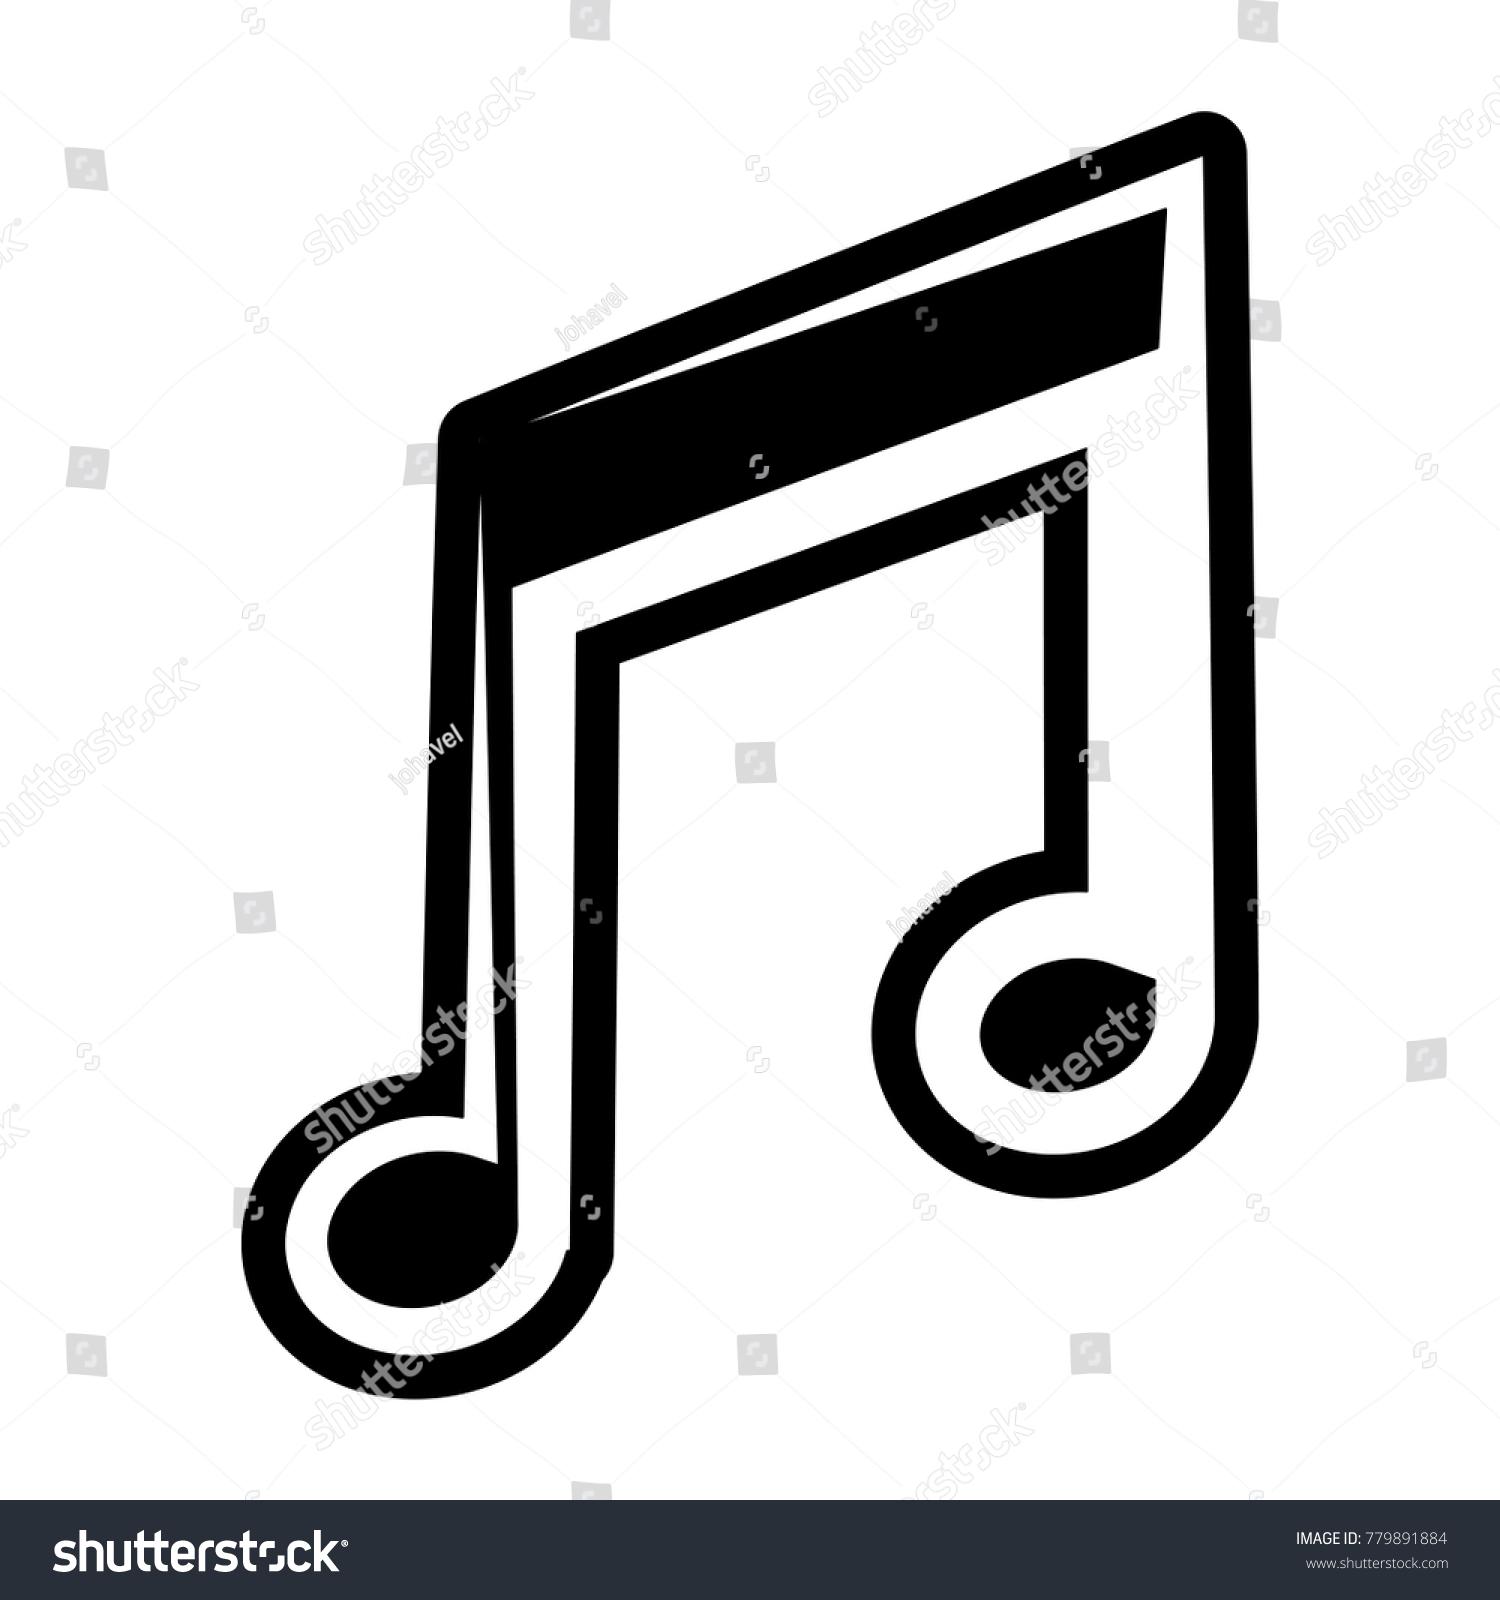 Music note symbol stock vector 779891884 shutterstock music note symbol biocorpaavc